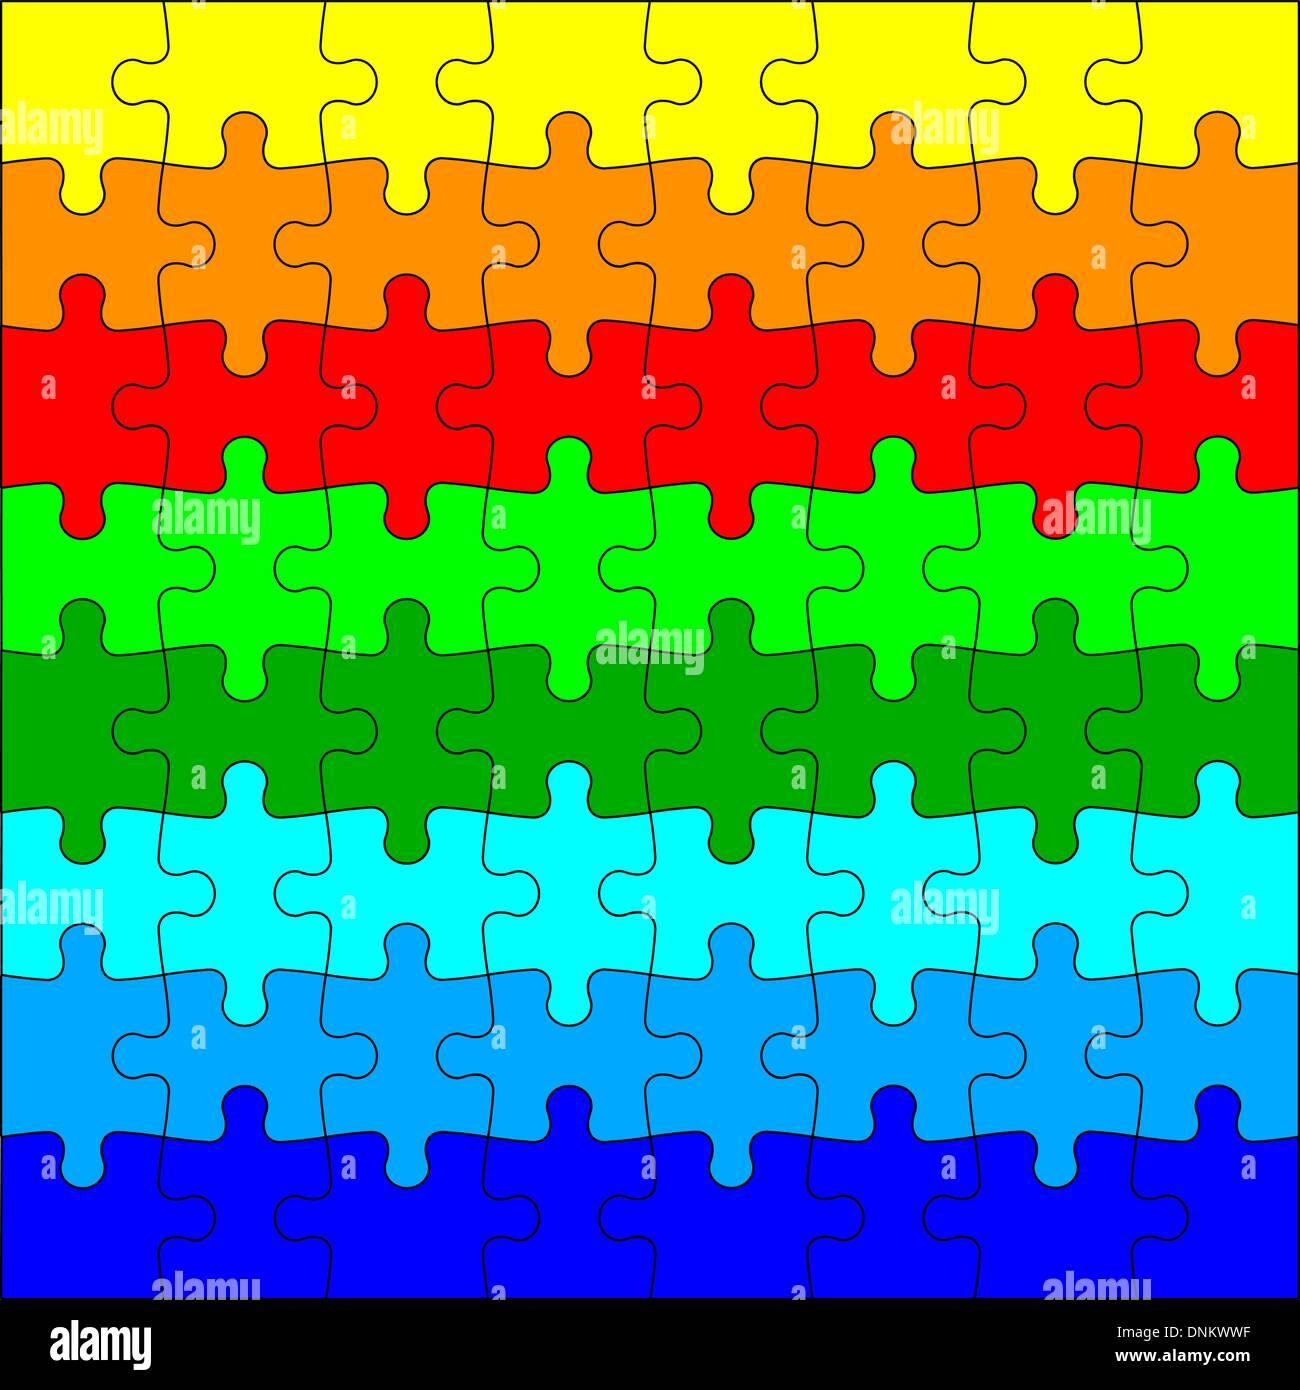 Antecedentes ilustración vectorial rompecabezas Imagen De Stock